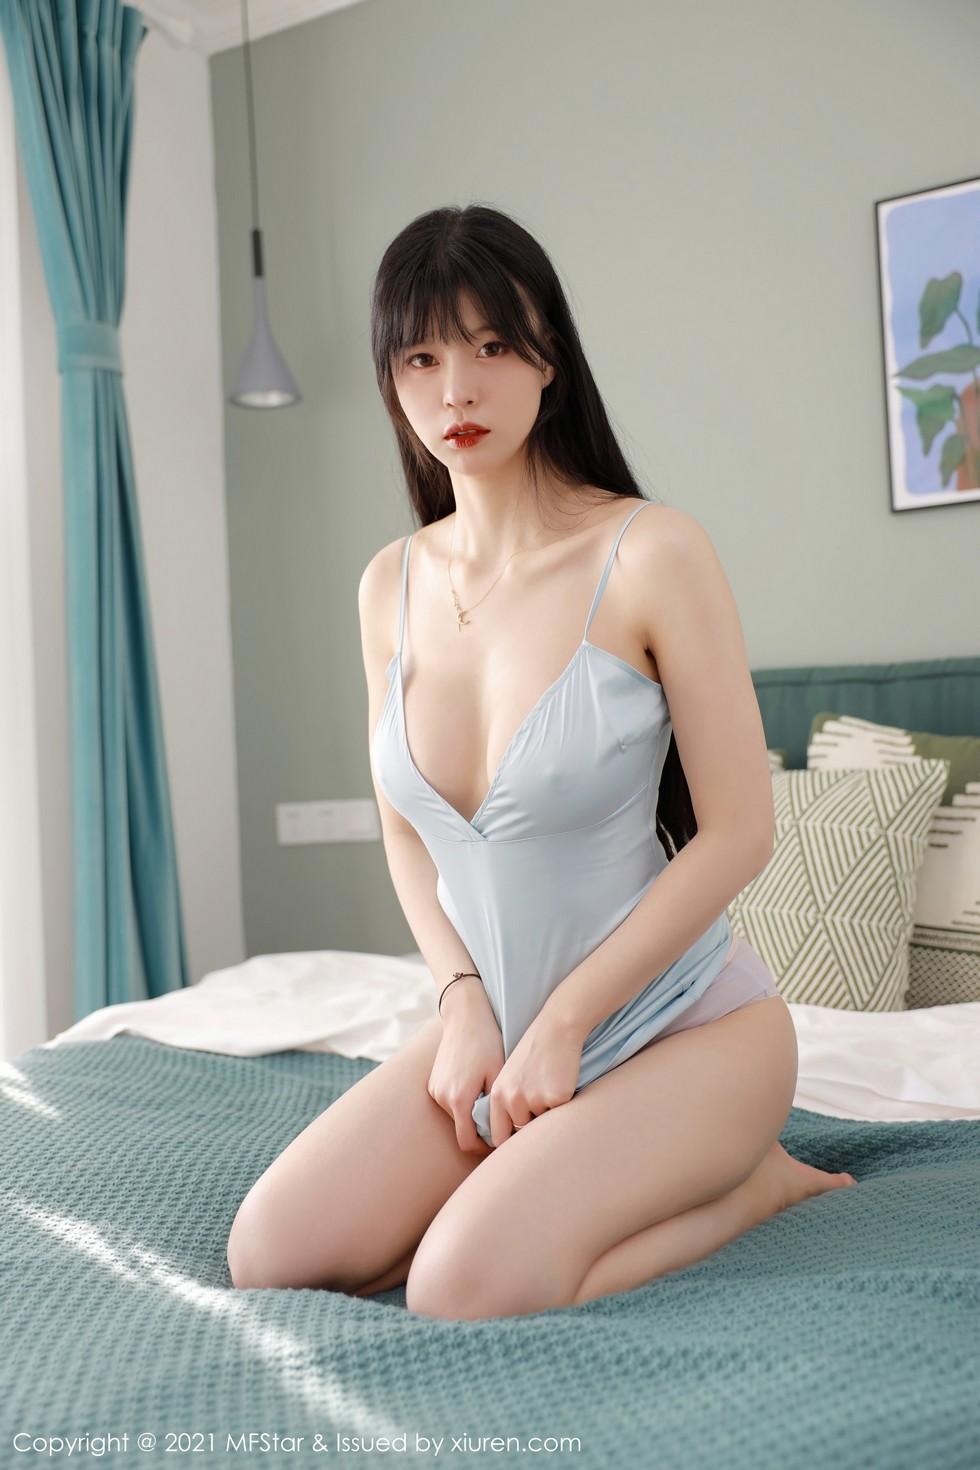 [MFStar模範學院]Vol.443桃香子淺藍色吊裙配粉色內褲半脫秀豪乳翹臀誘惑寫真 - 貼圖 - 清涼寫真 -